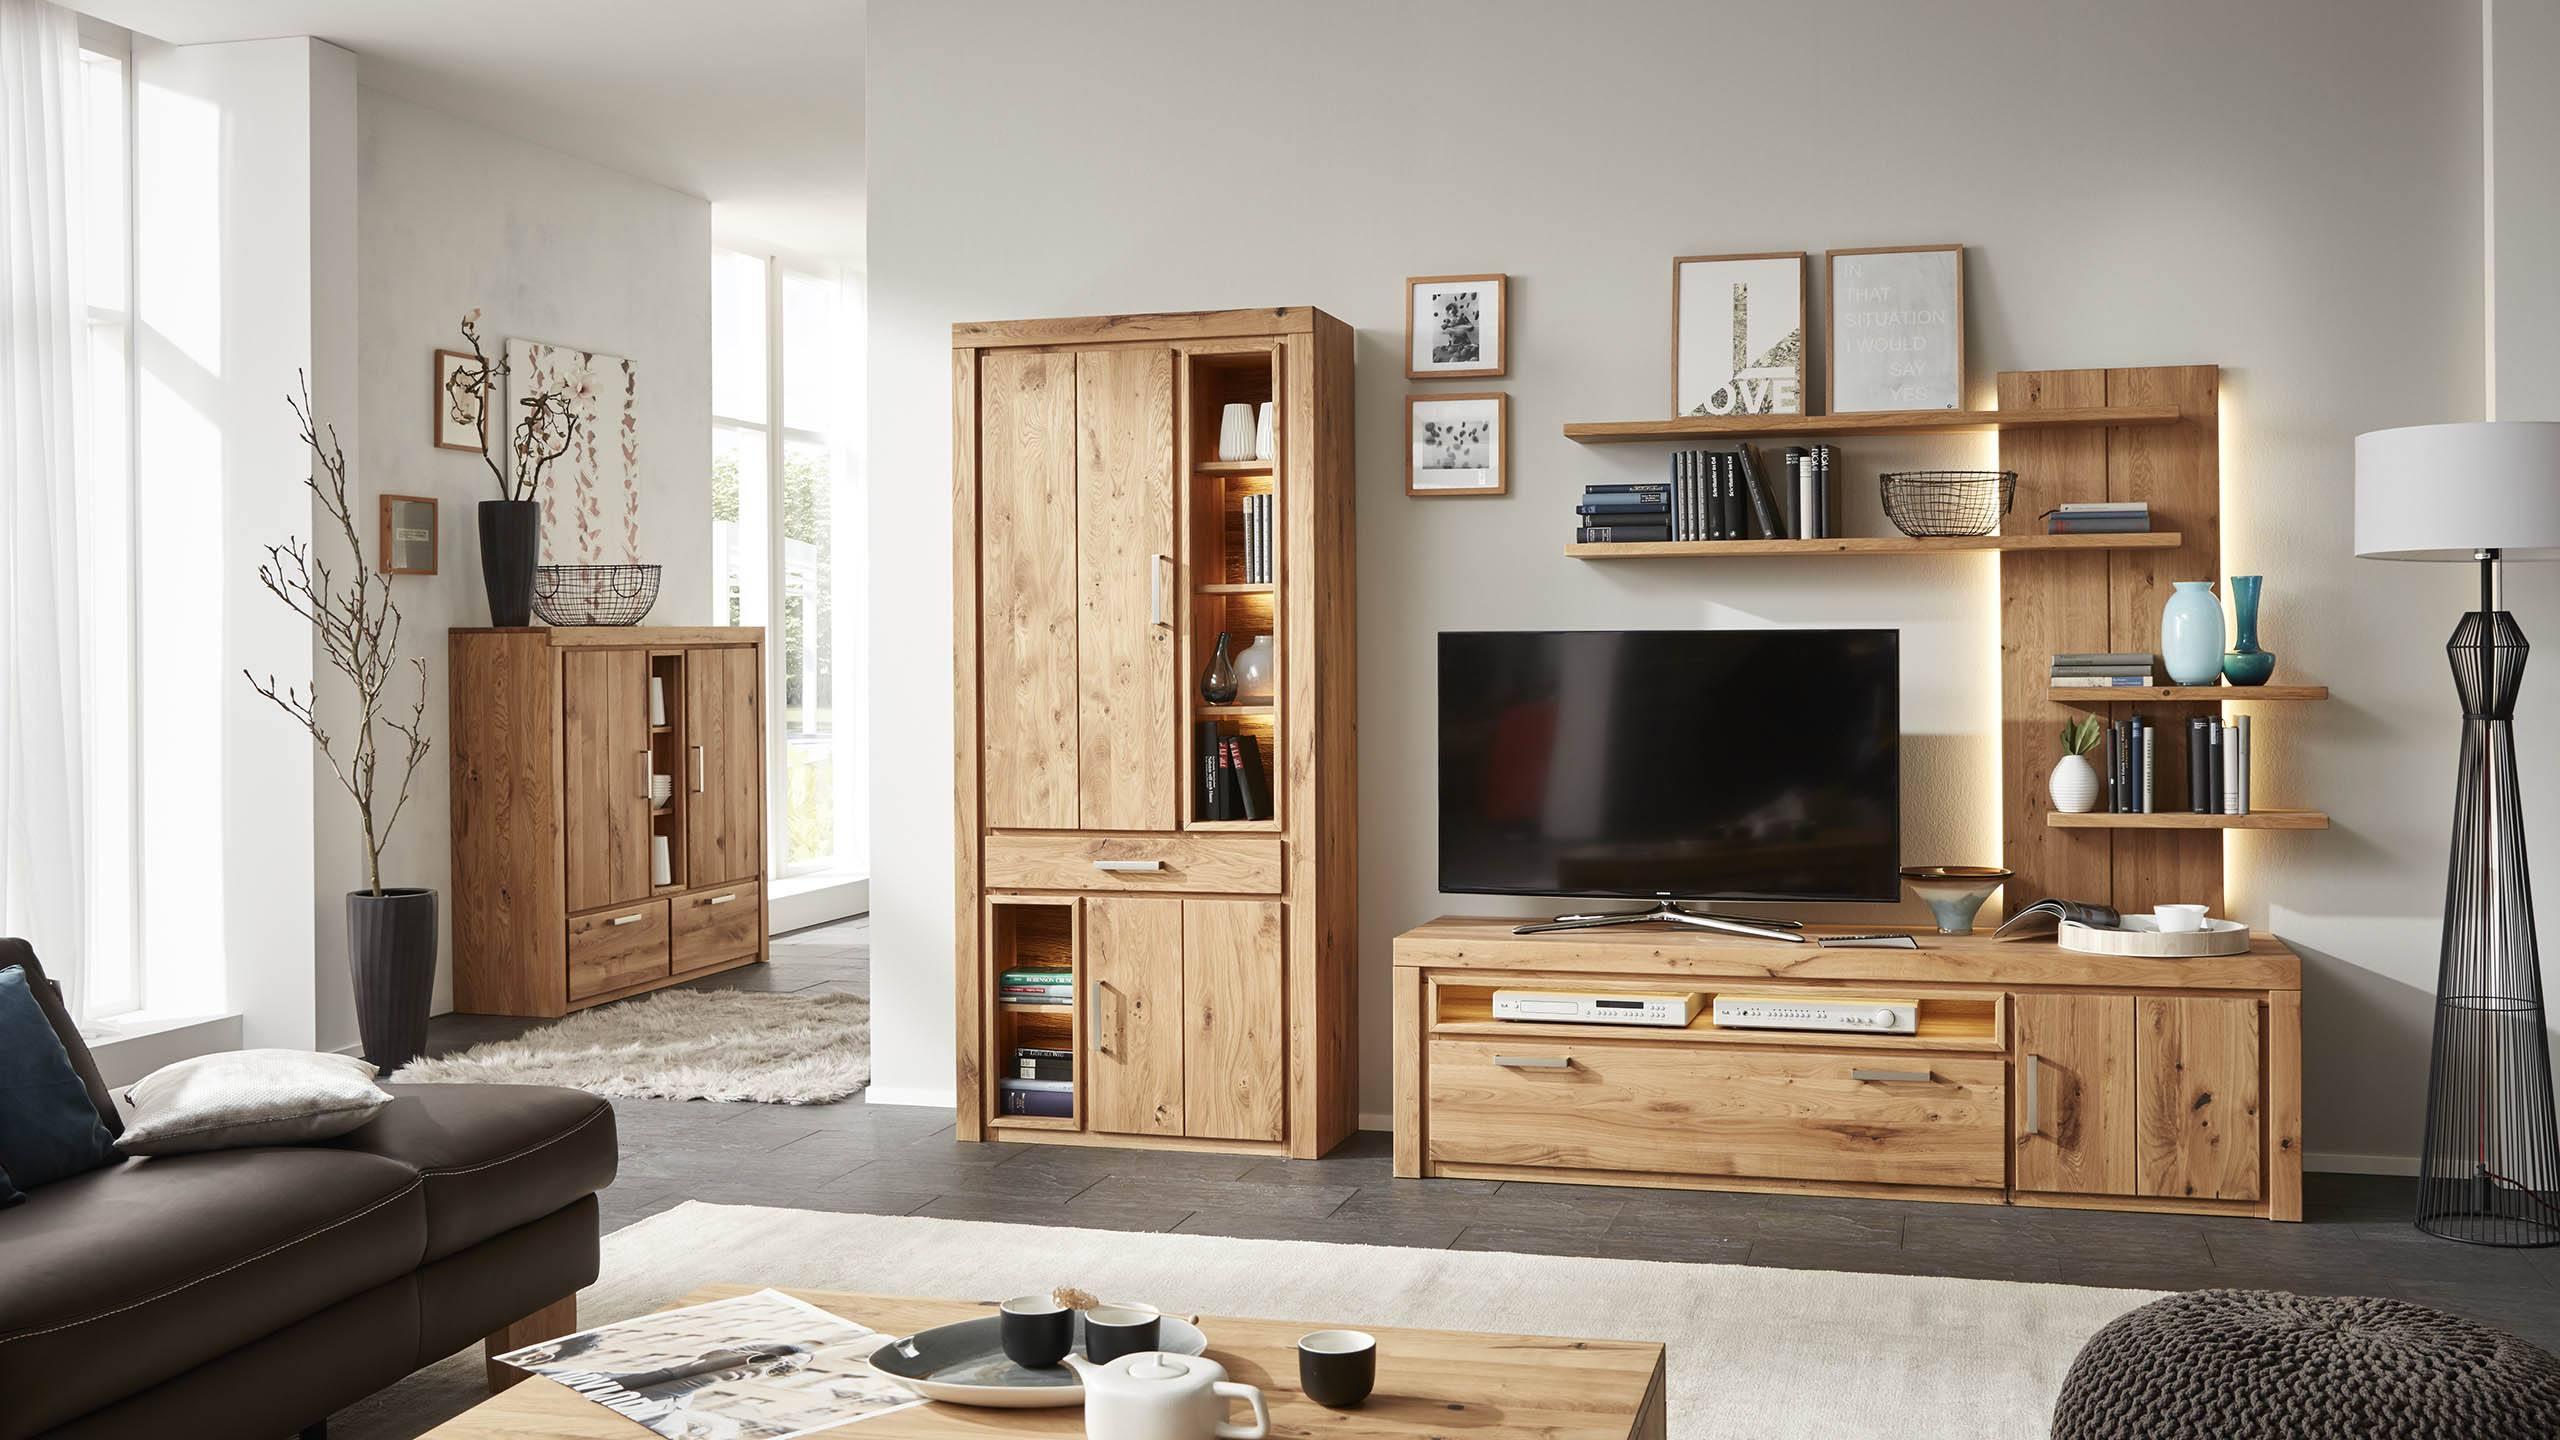 interliving m bel wohnzimmer m bel schaumann kassel. Black Bedroom Furniture Sets. Home Design Ideas